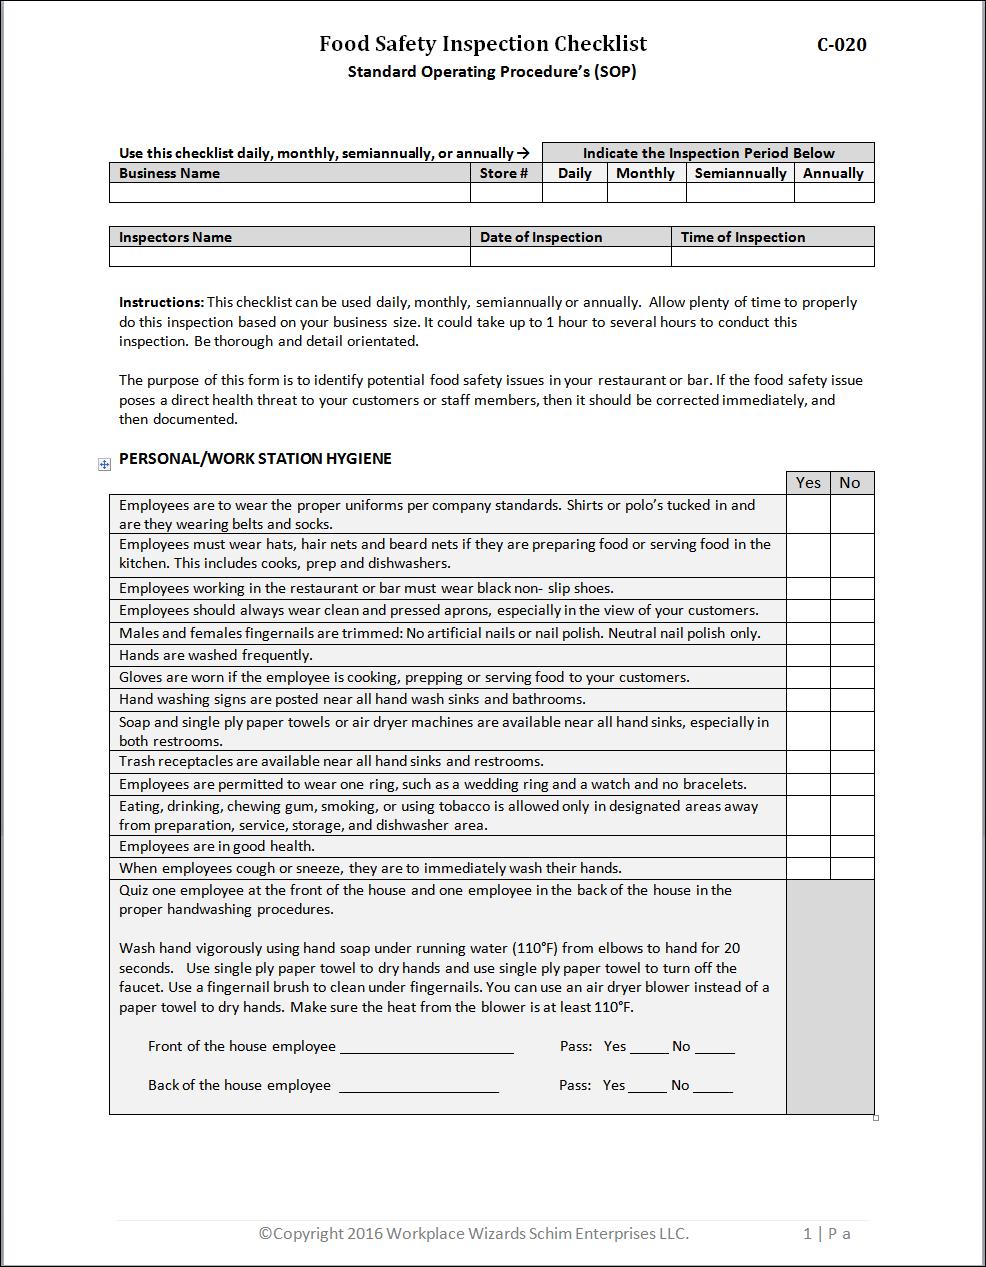 Food Safety Inspection Checklist Workplacewizards